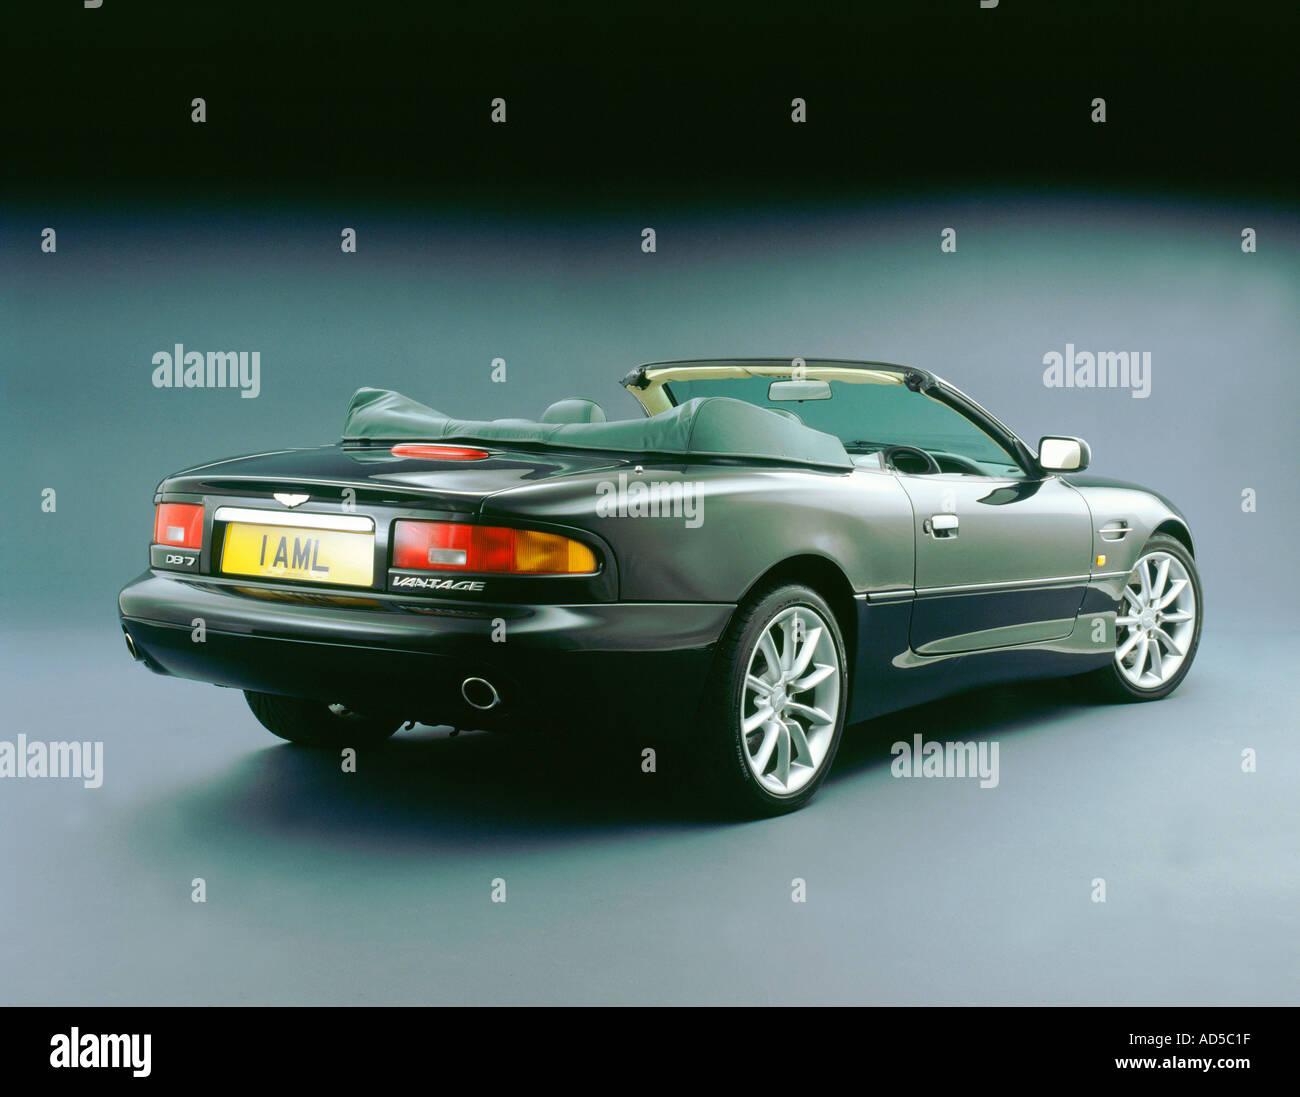 2001 Aston Martin DB7 Vantage V12 - Stock Image